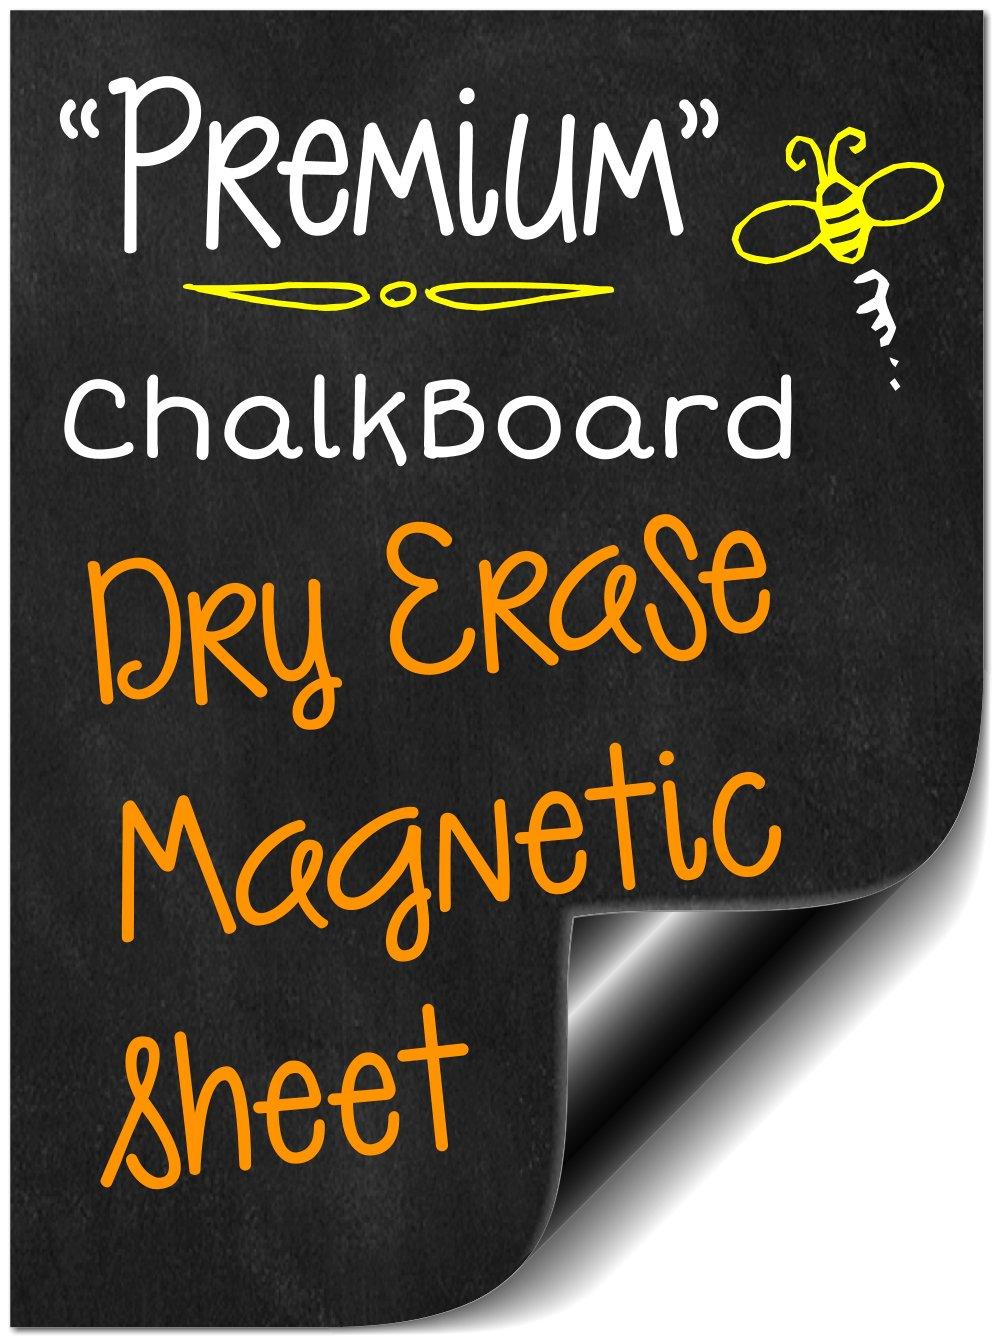 "Bigtime 16"" Flexible Magnetic Black Dry Erase Chalkboard Design | Message Board for Refrigerator | Use as Weekly Planner Calendar | Make Your Own Behavior or Reward Chart | Magnet Sheet is Cuttable"